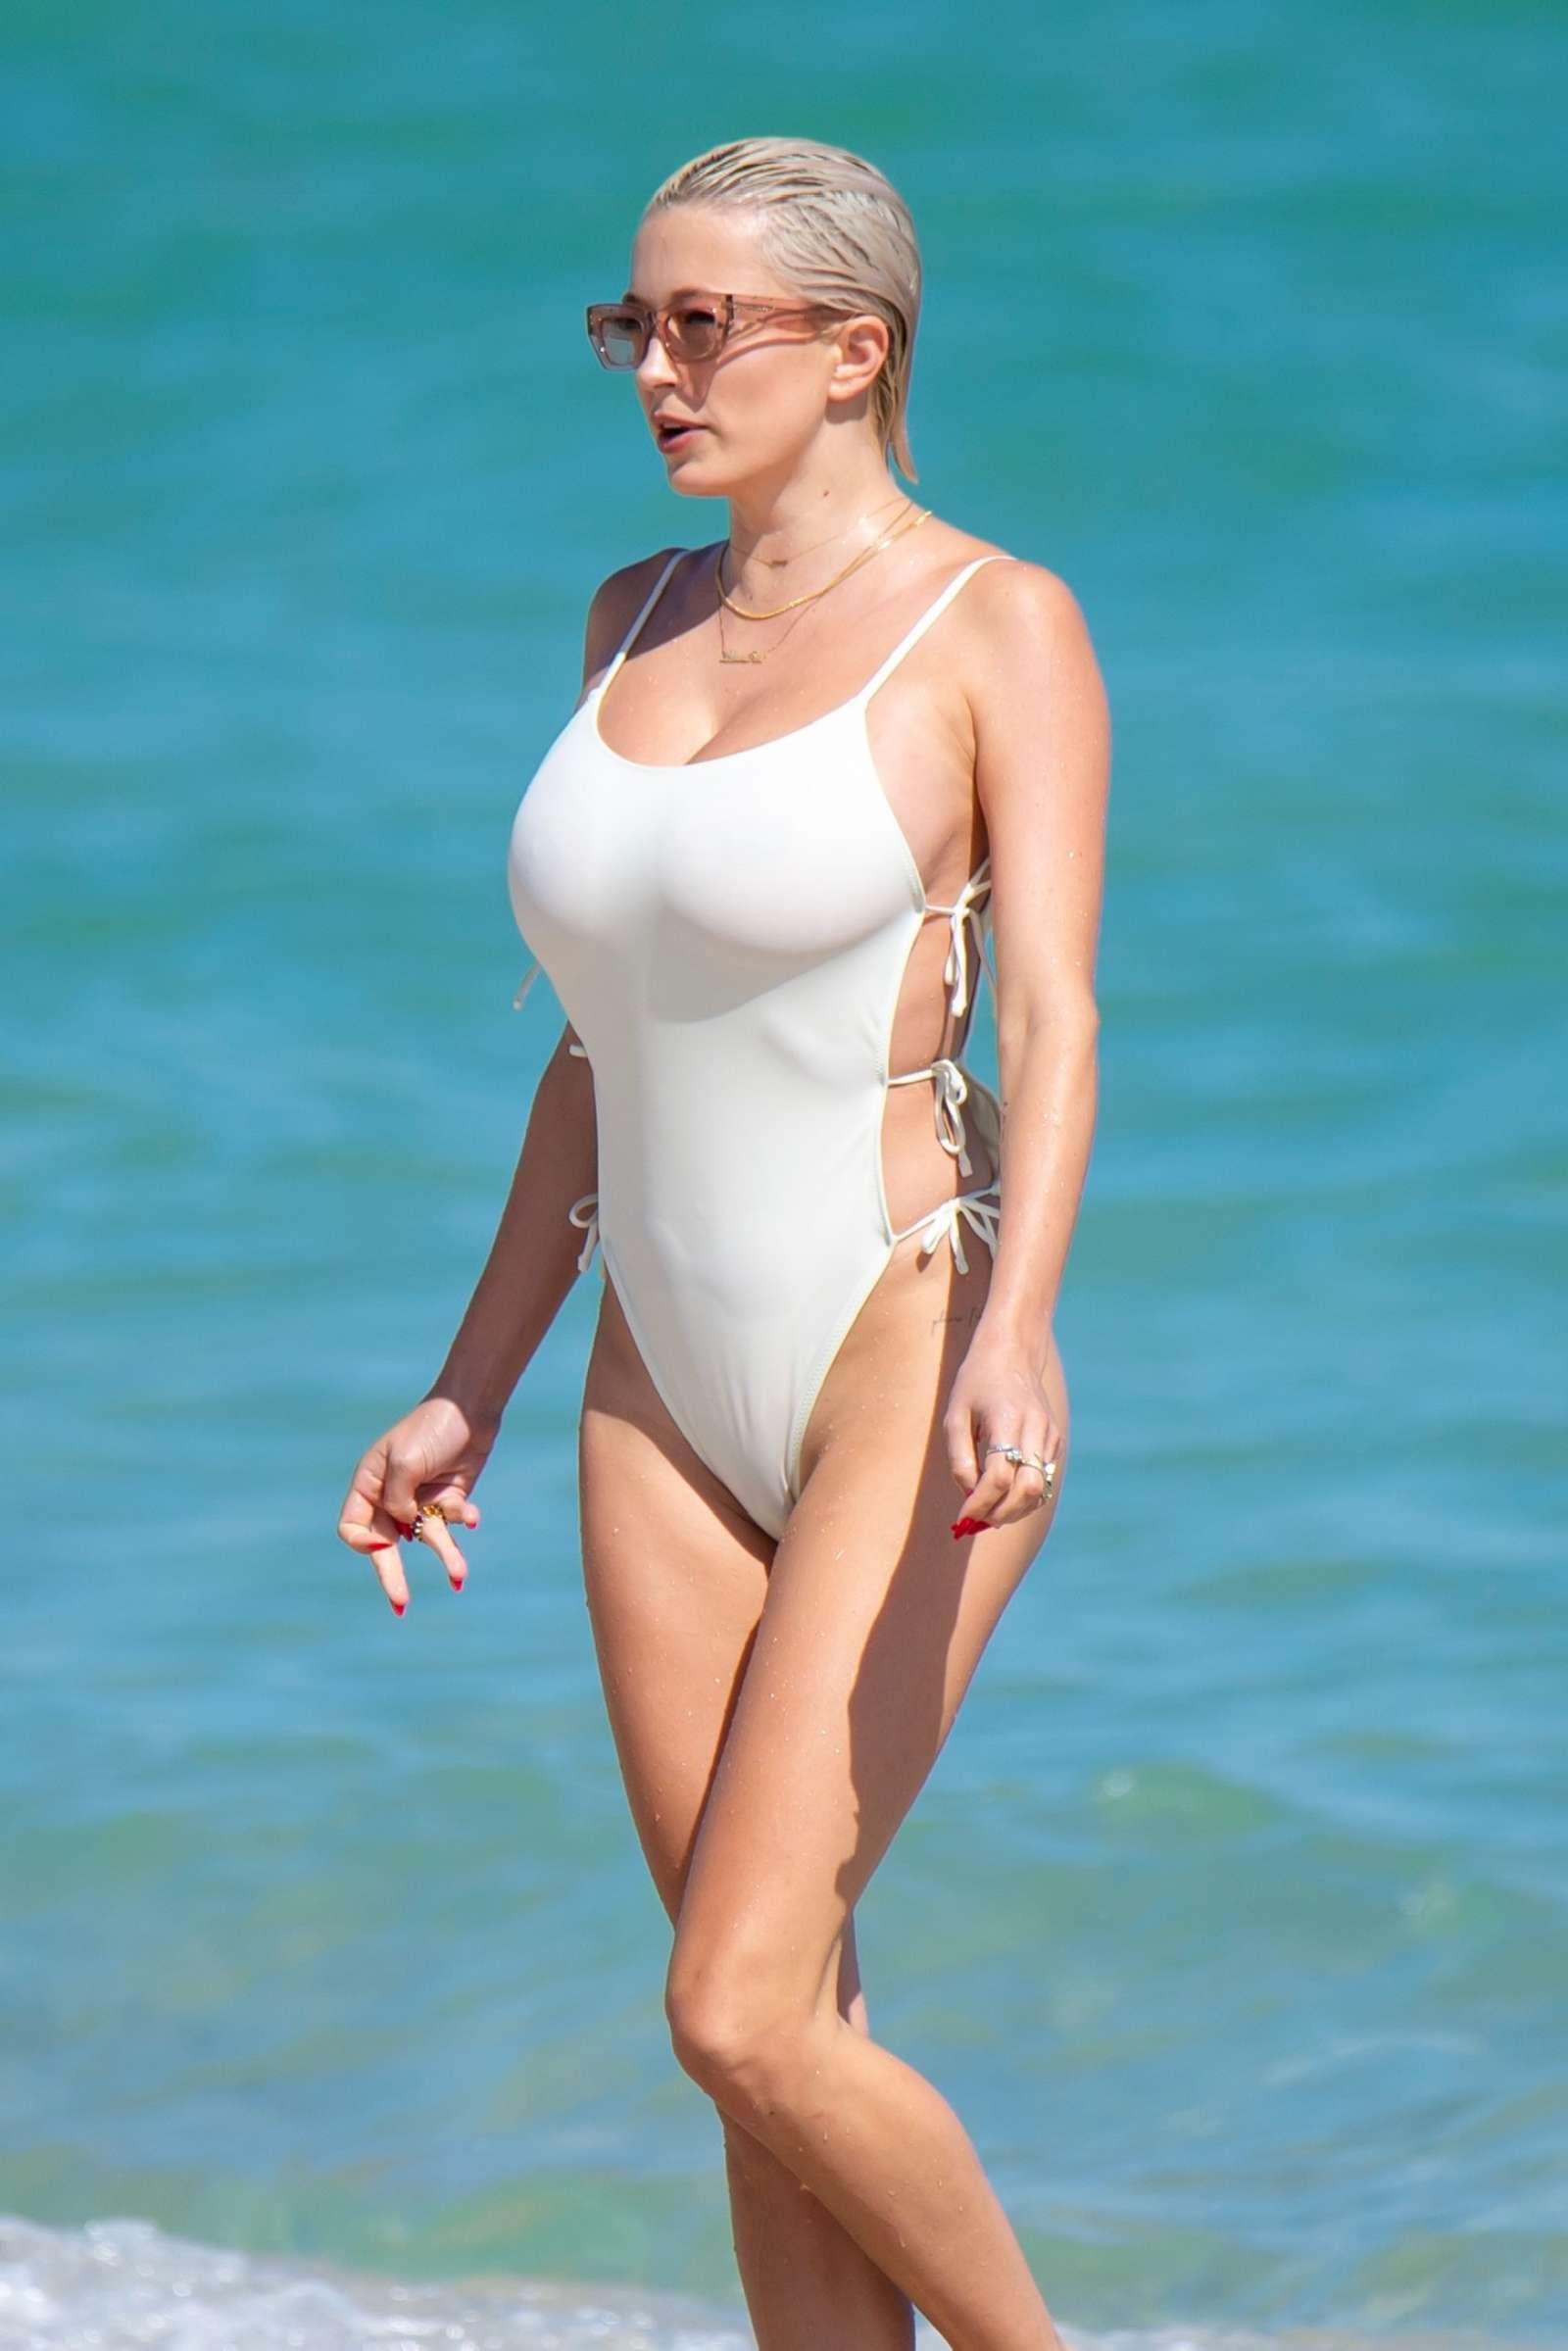 Caroline Vreeland in White Swimsuit at the beach in Miami